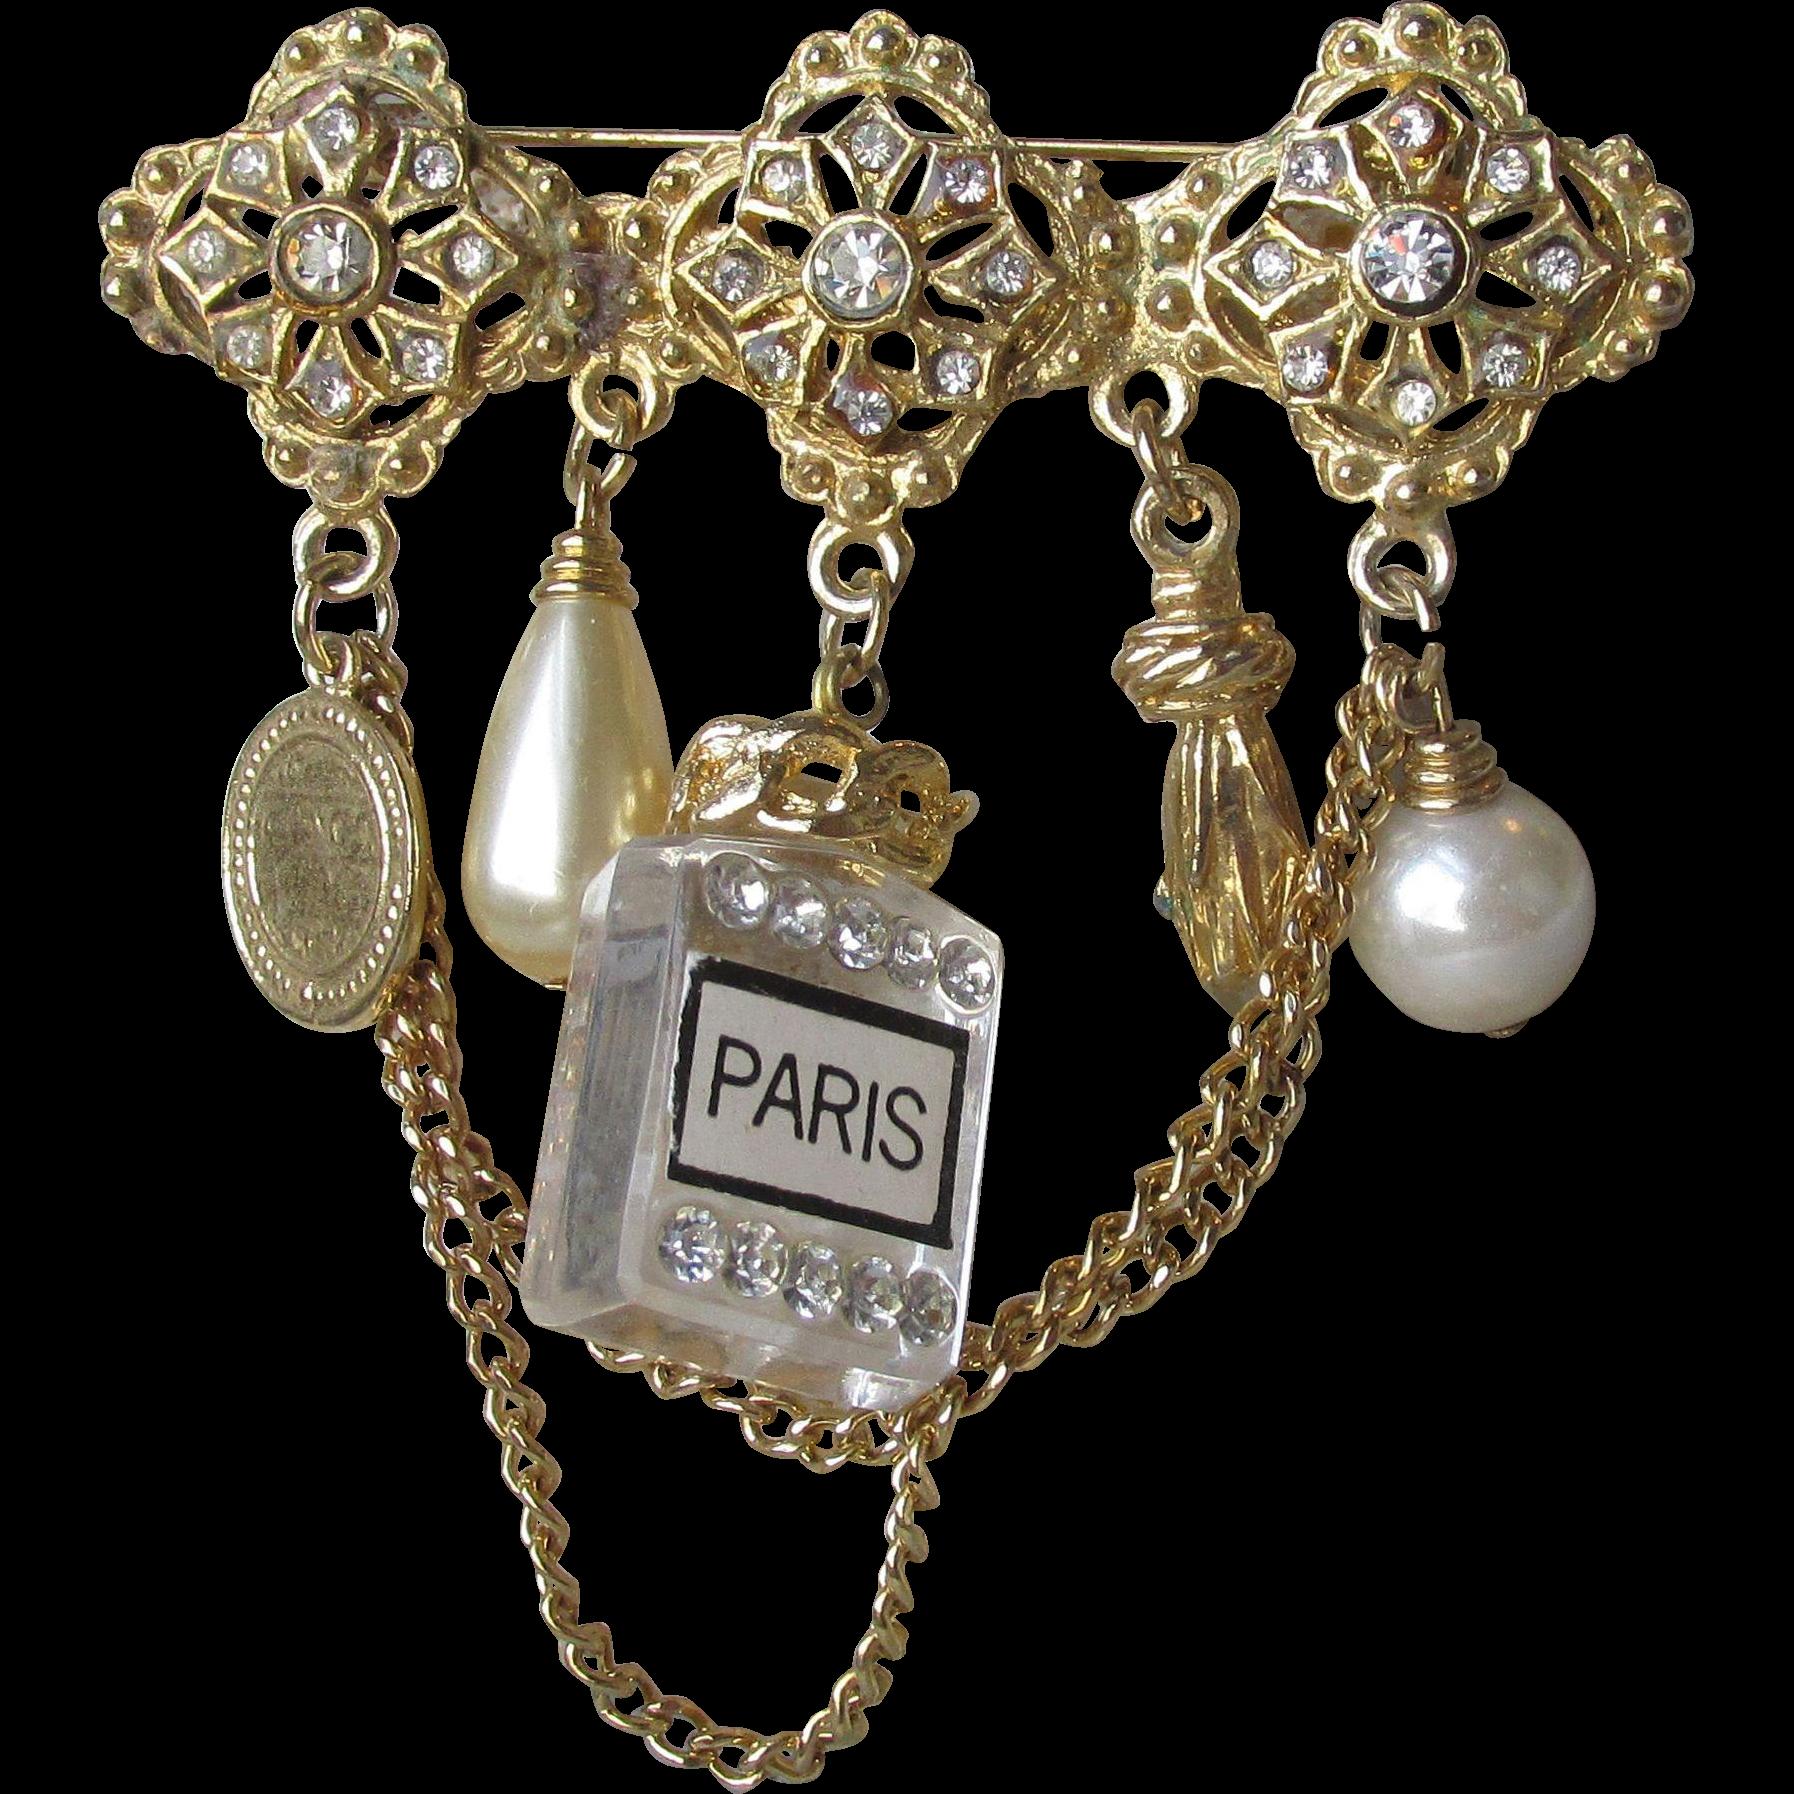 BIG Vintage 1960's PARIS Perfume Bottle, Faux Pearl, Coin & Chain Dangle Brooch